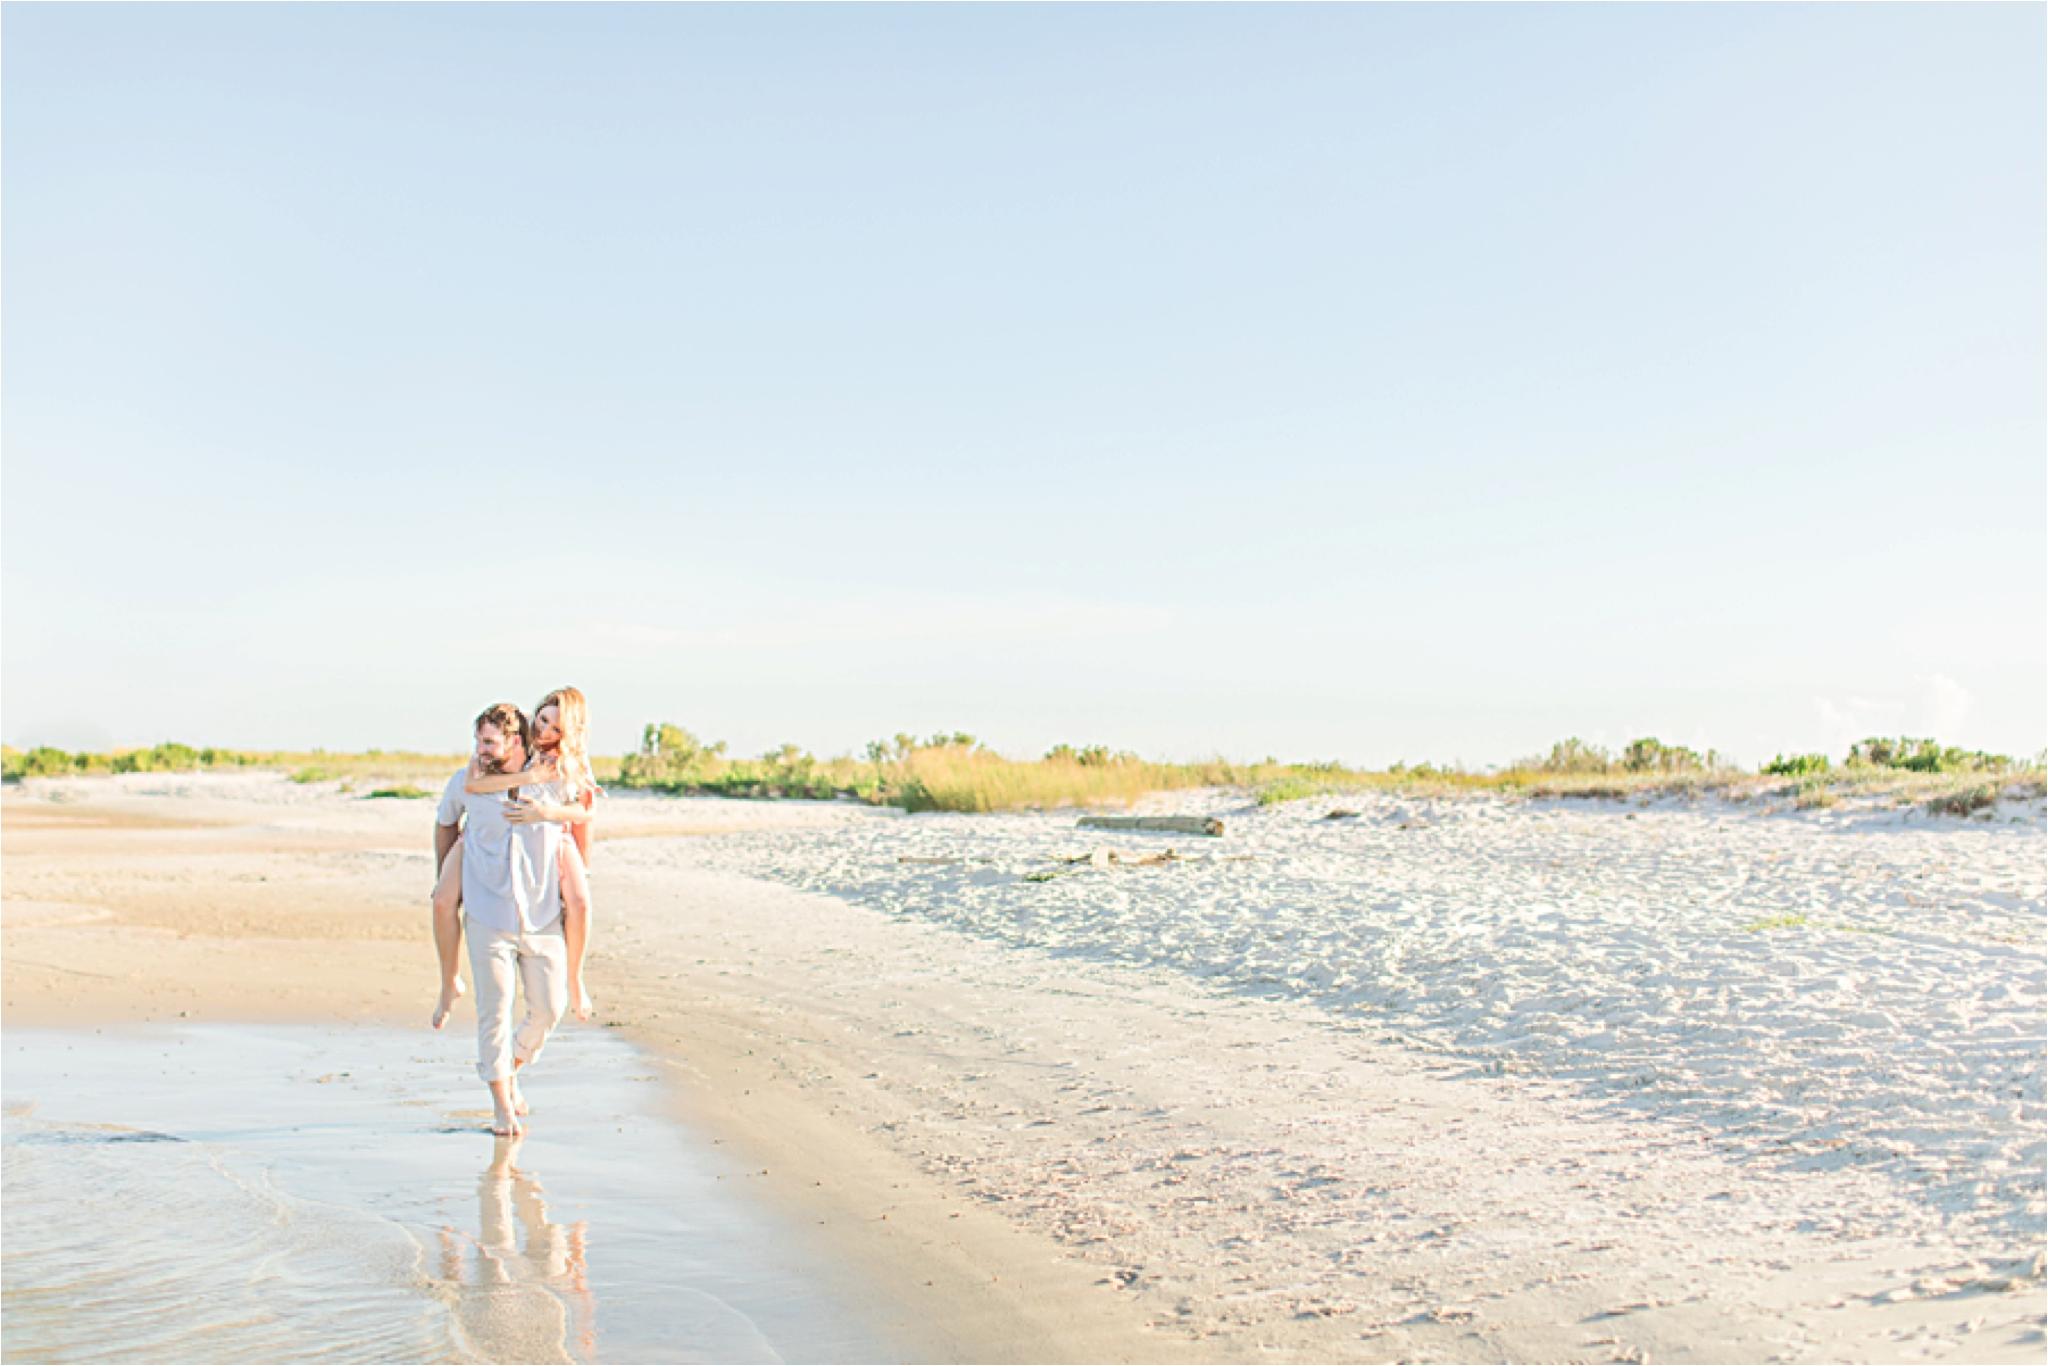 Beach engagement photos | Daulphin Island | Mobile wedding photographer | Candid couples |